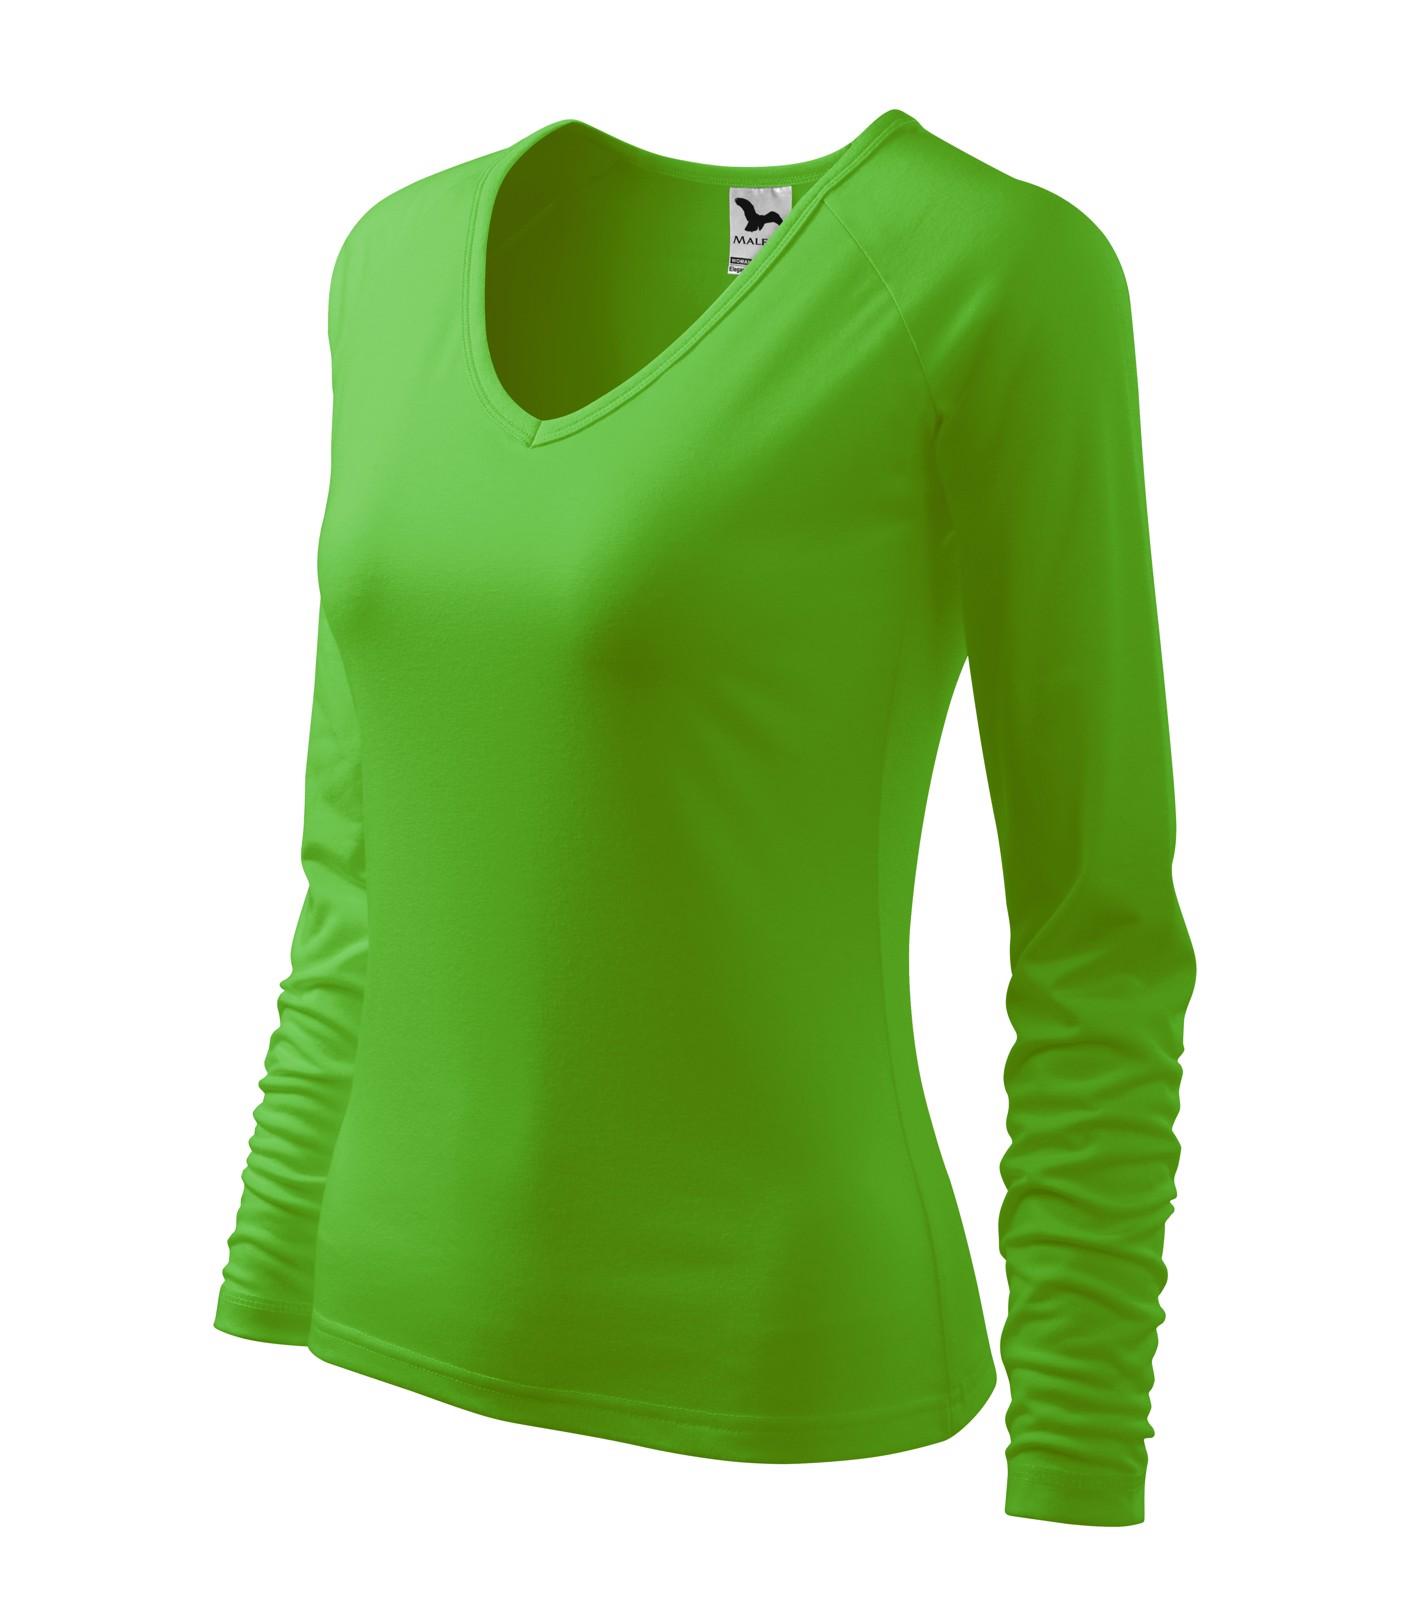 T-shirt women's Malfini Elegance - Apple Green / 2XL